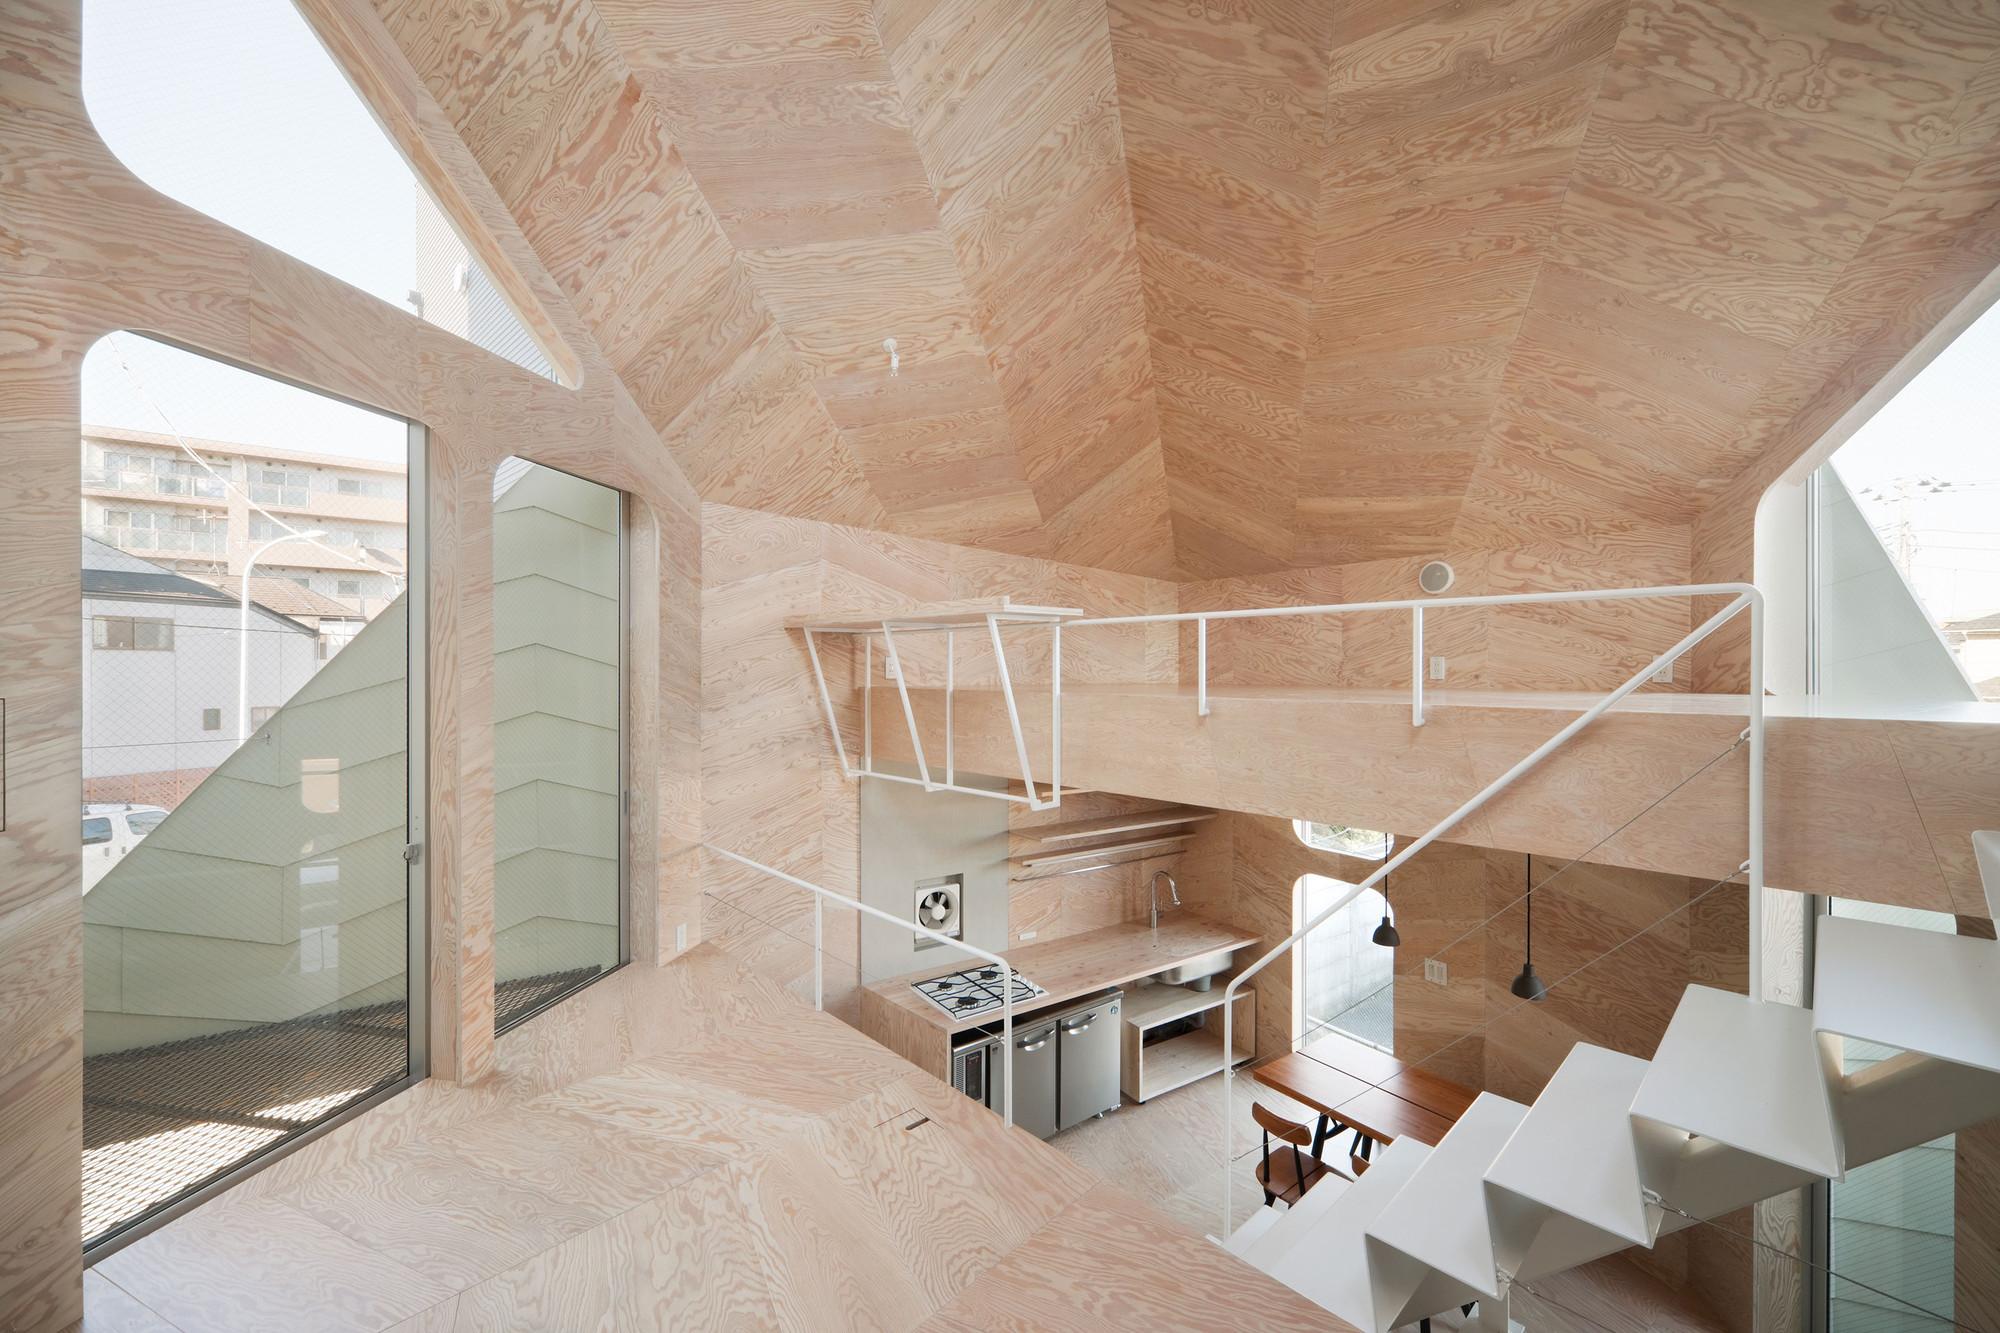 Casa Tsubomi / FLAT HOUSE, © Takumi Ota